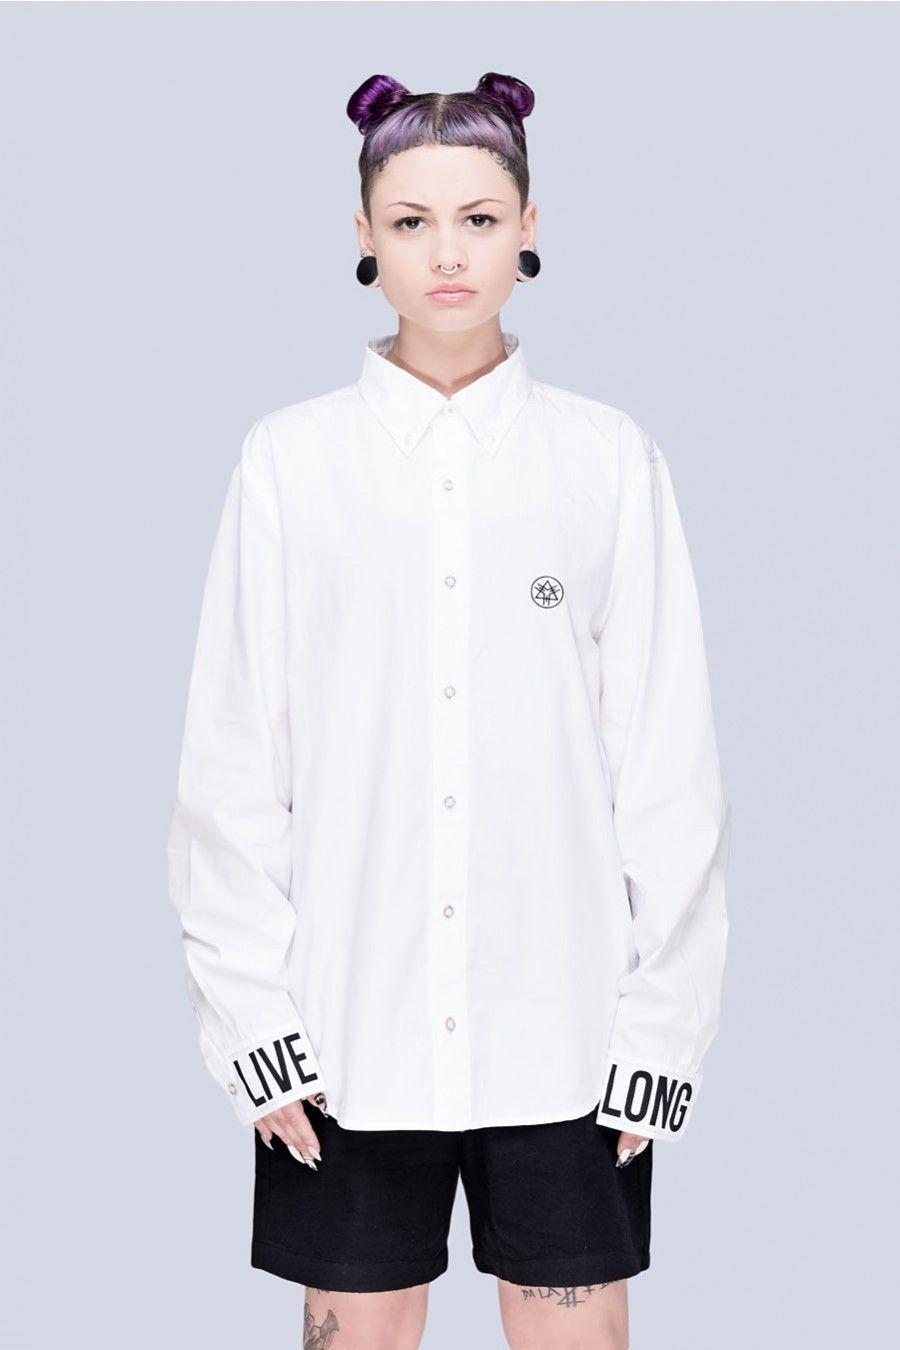 Live Long Buttoned Shirt (W) - Unisex - Store